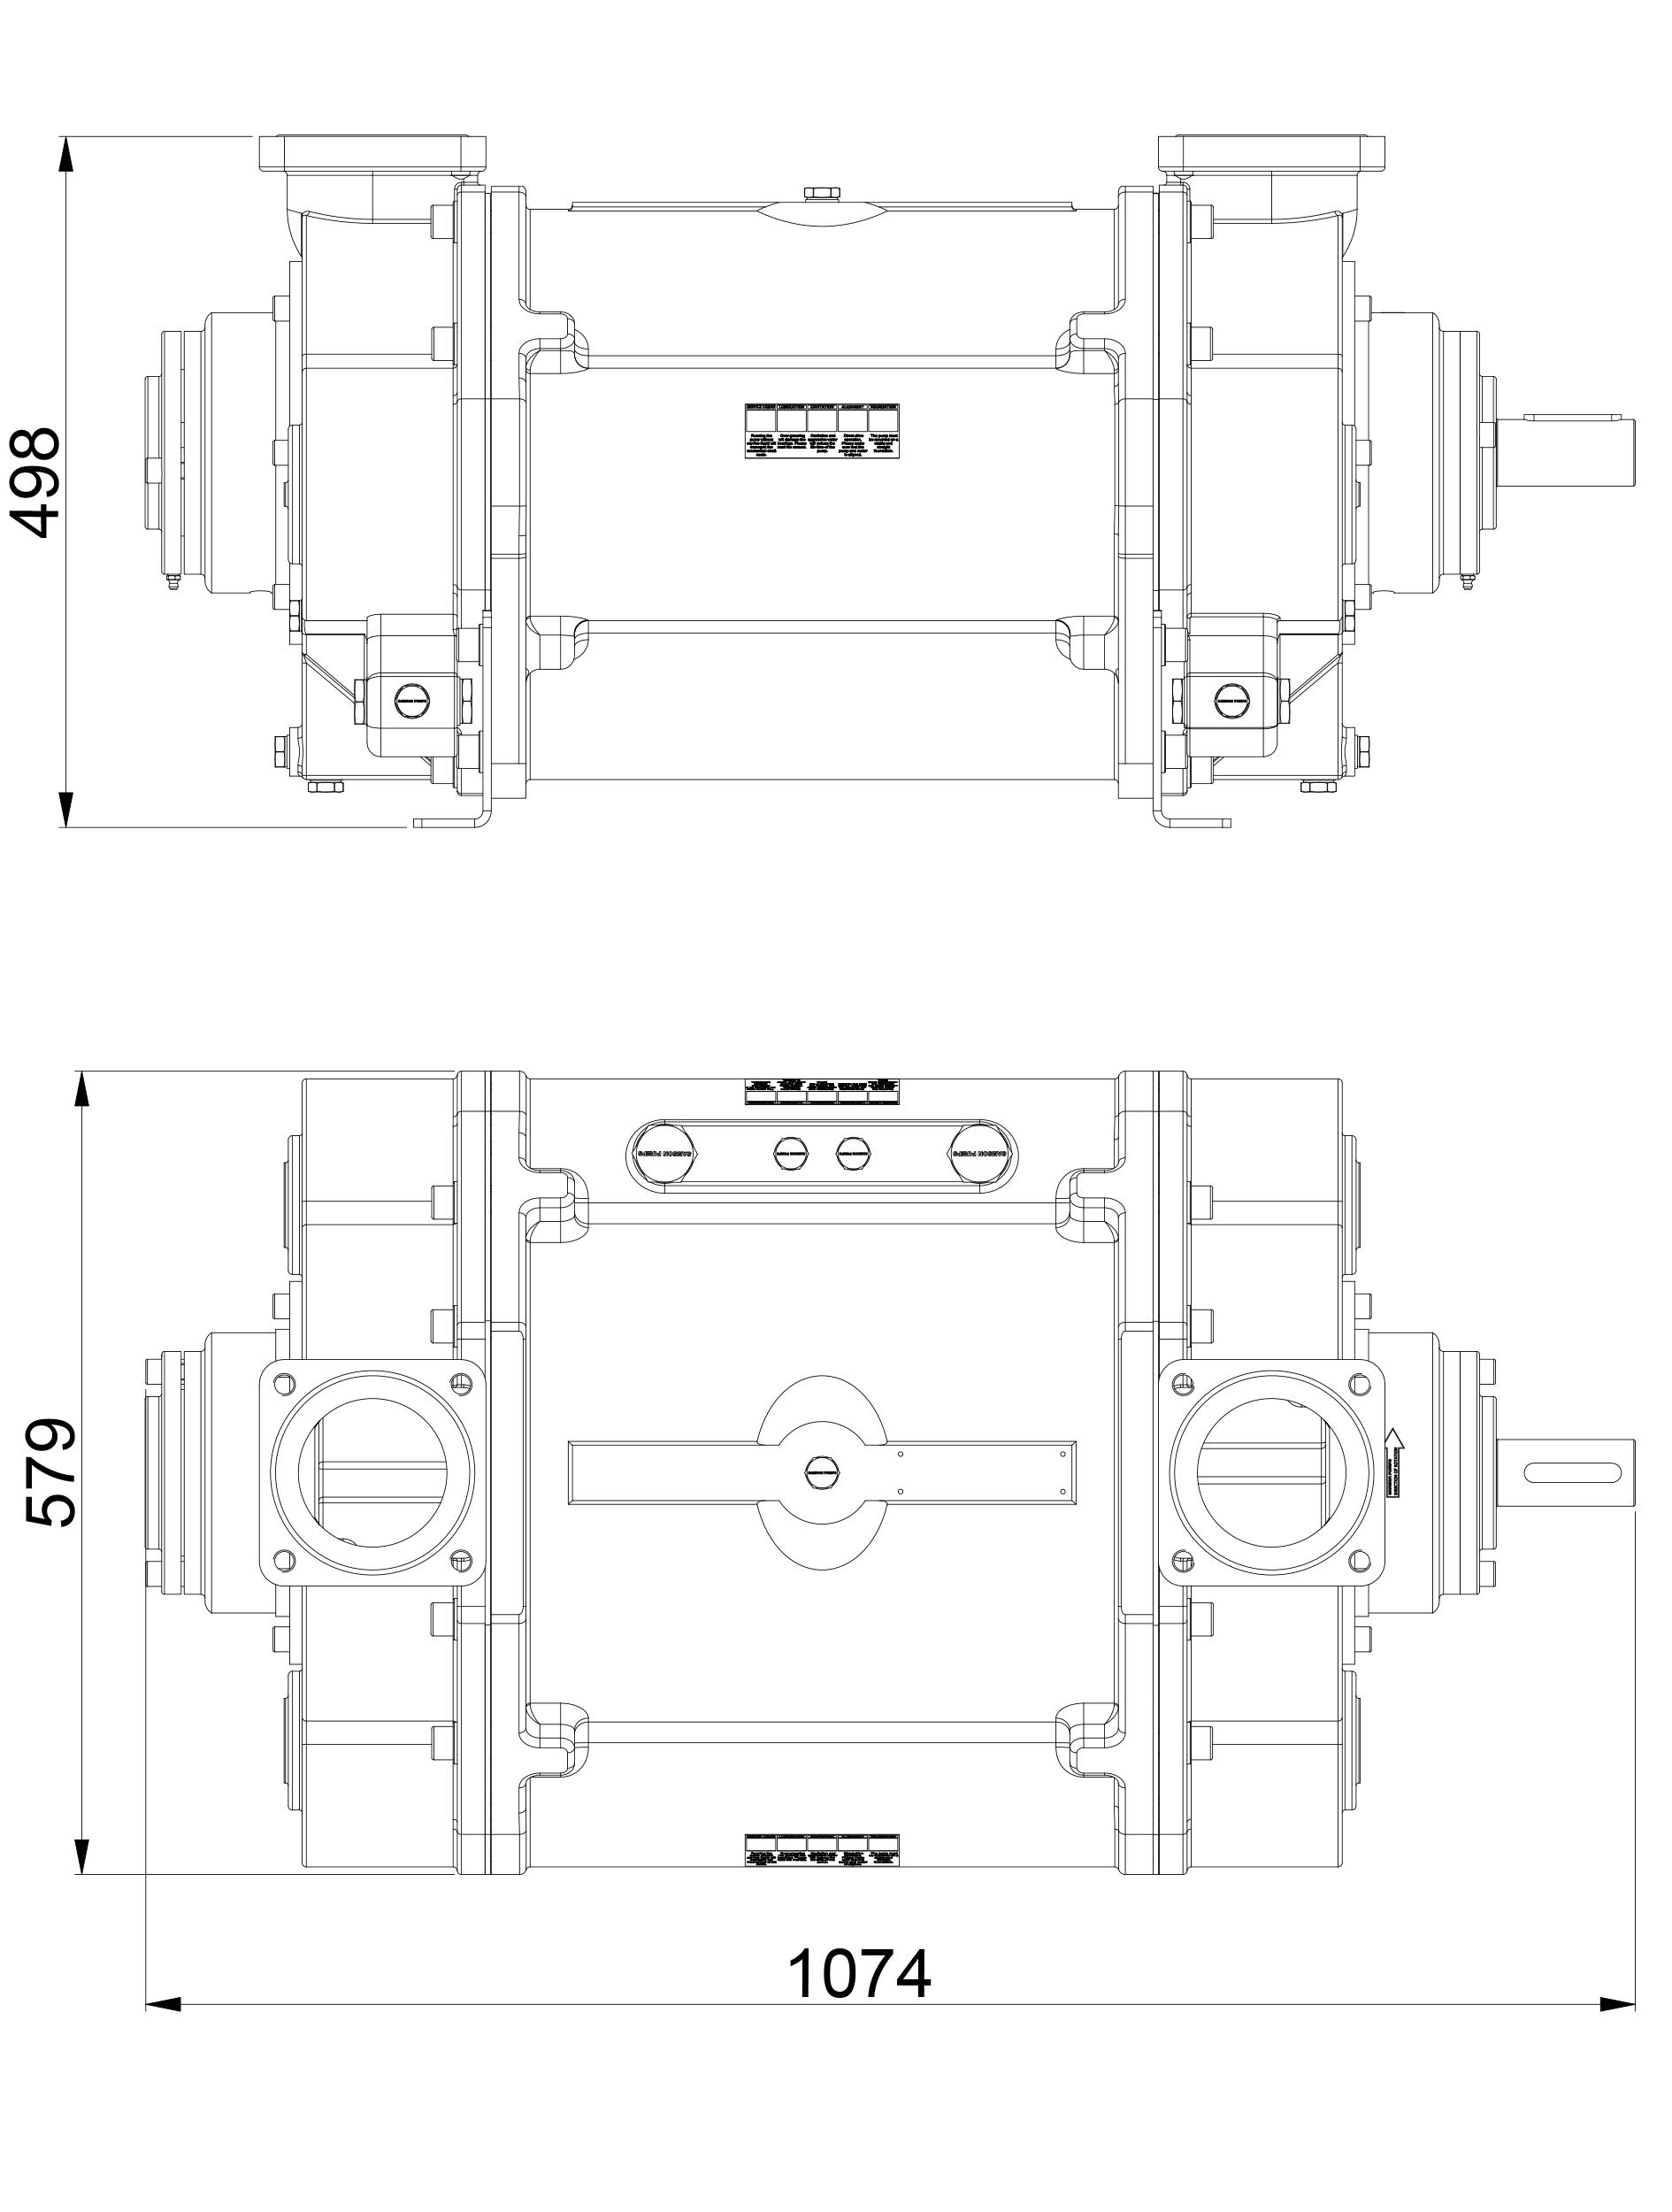 TM2500 g2.0 Dimensions